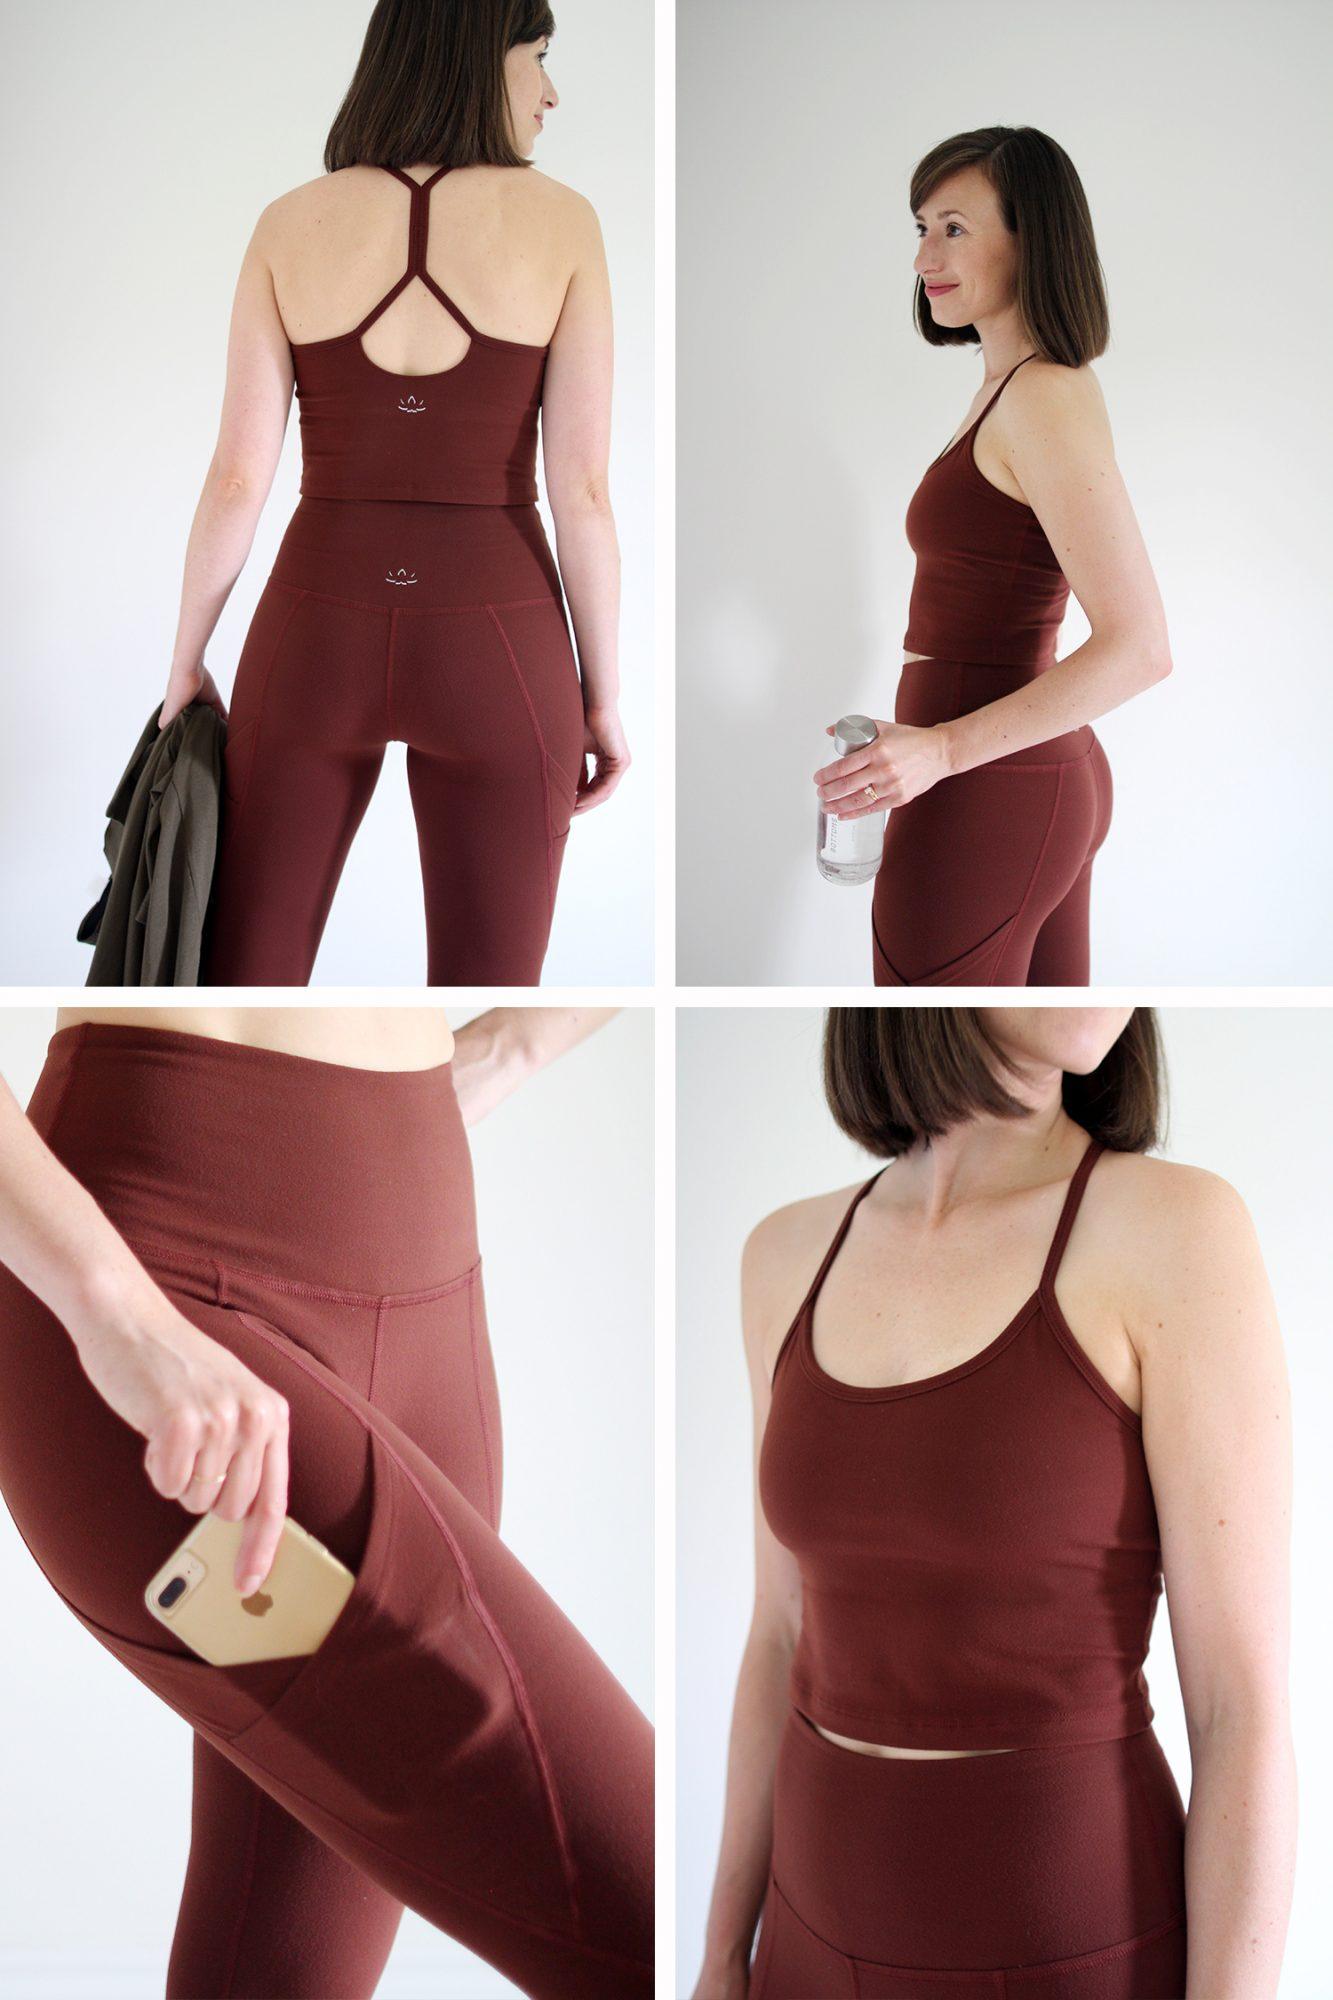 Style Bee - Summer 10x10 - Activewear Edition - Look 4